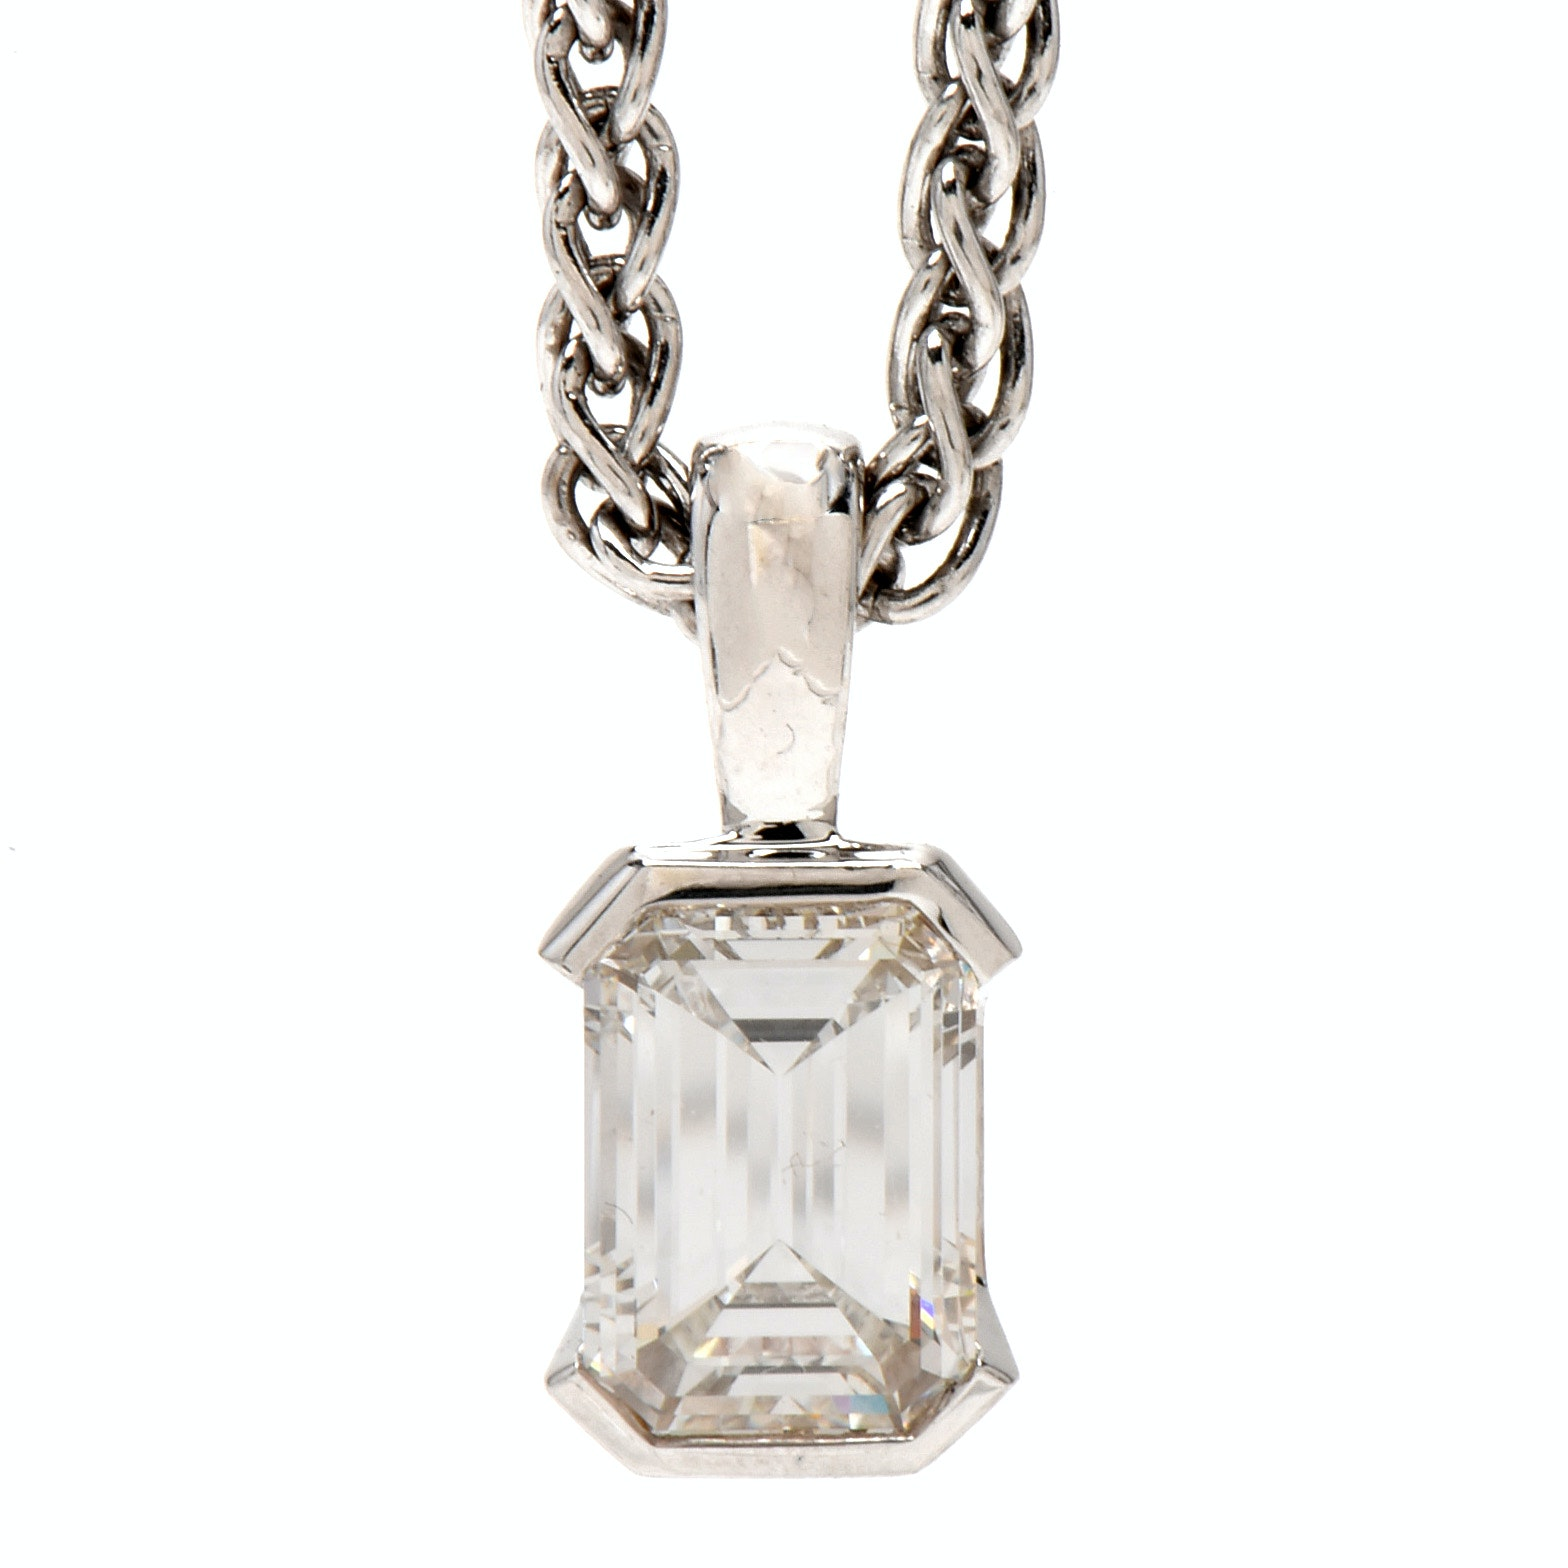 14K White Gold 2.20 CT Emerald Cut Diamond Drop Pendant Necklace